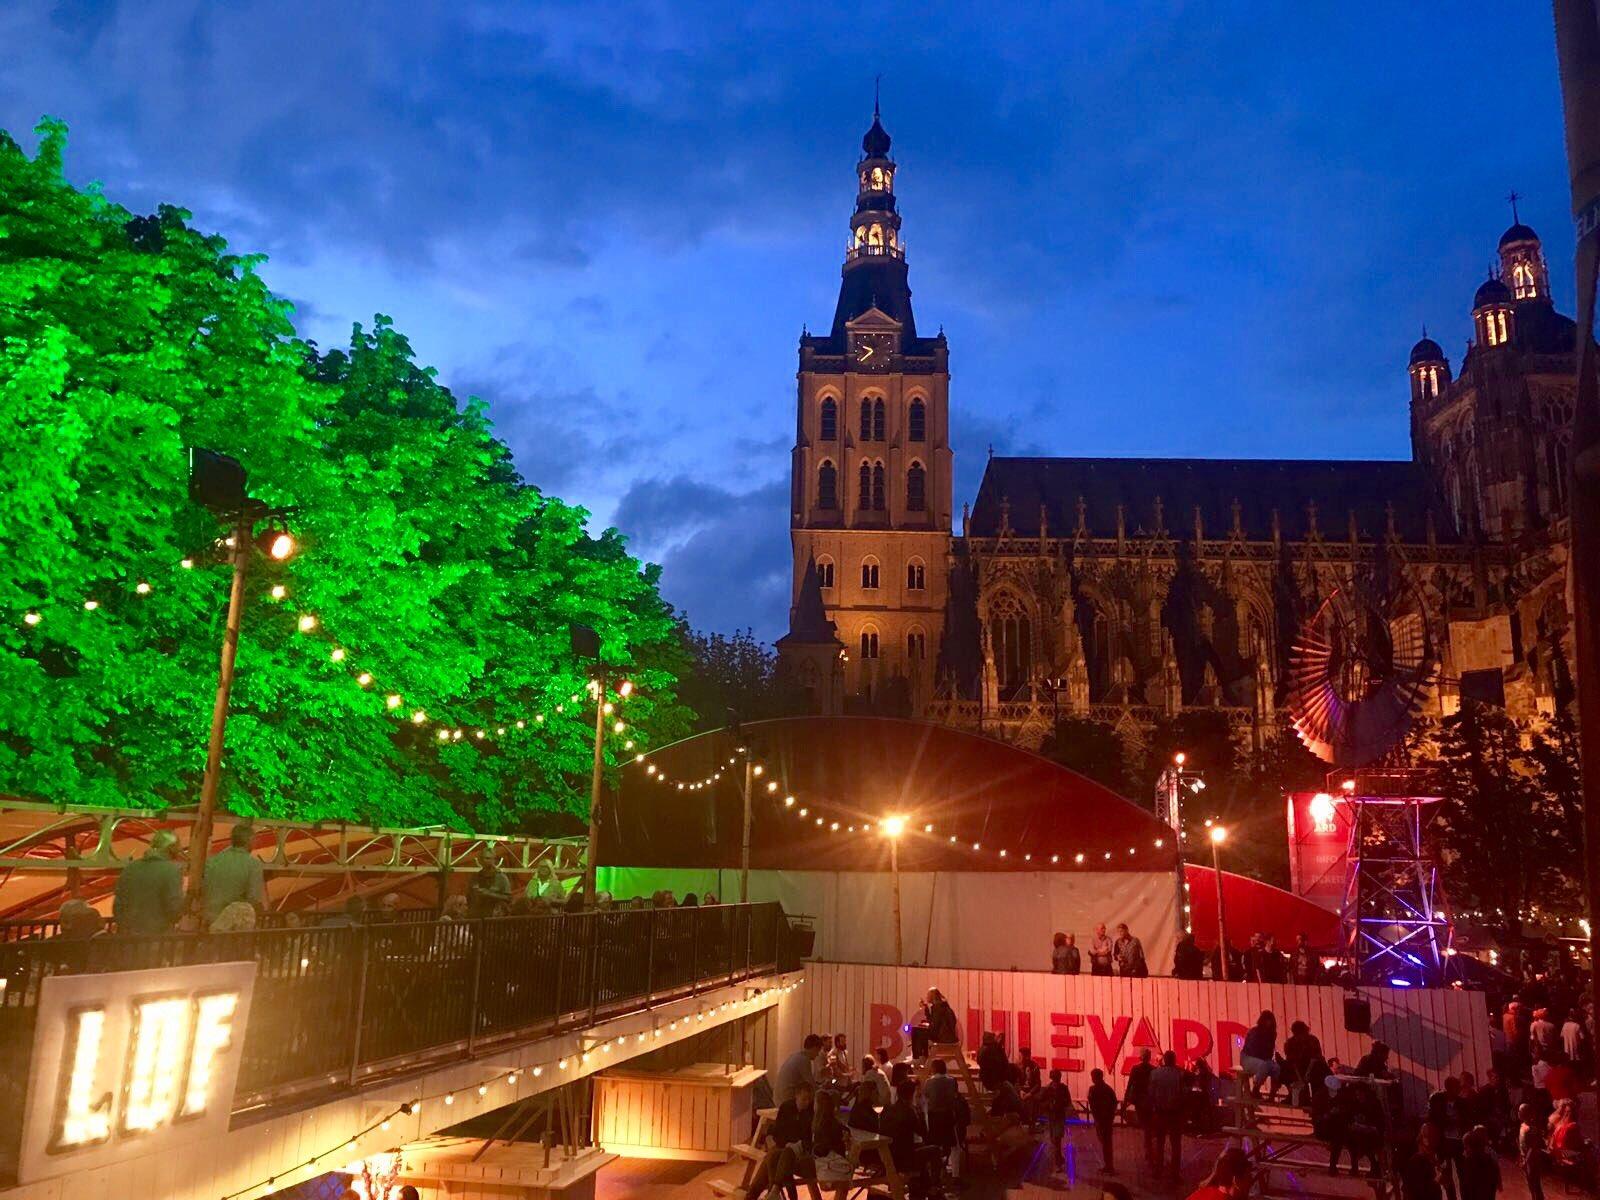 Prachtige avond theater festival @TFBoulevard @shertogenbosch https://t.co/R3UngrY7xX